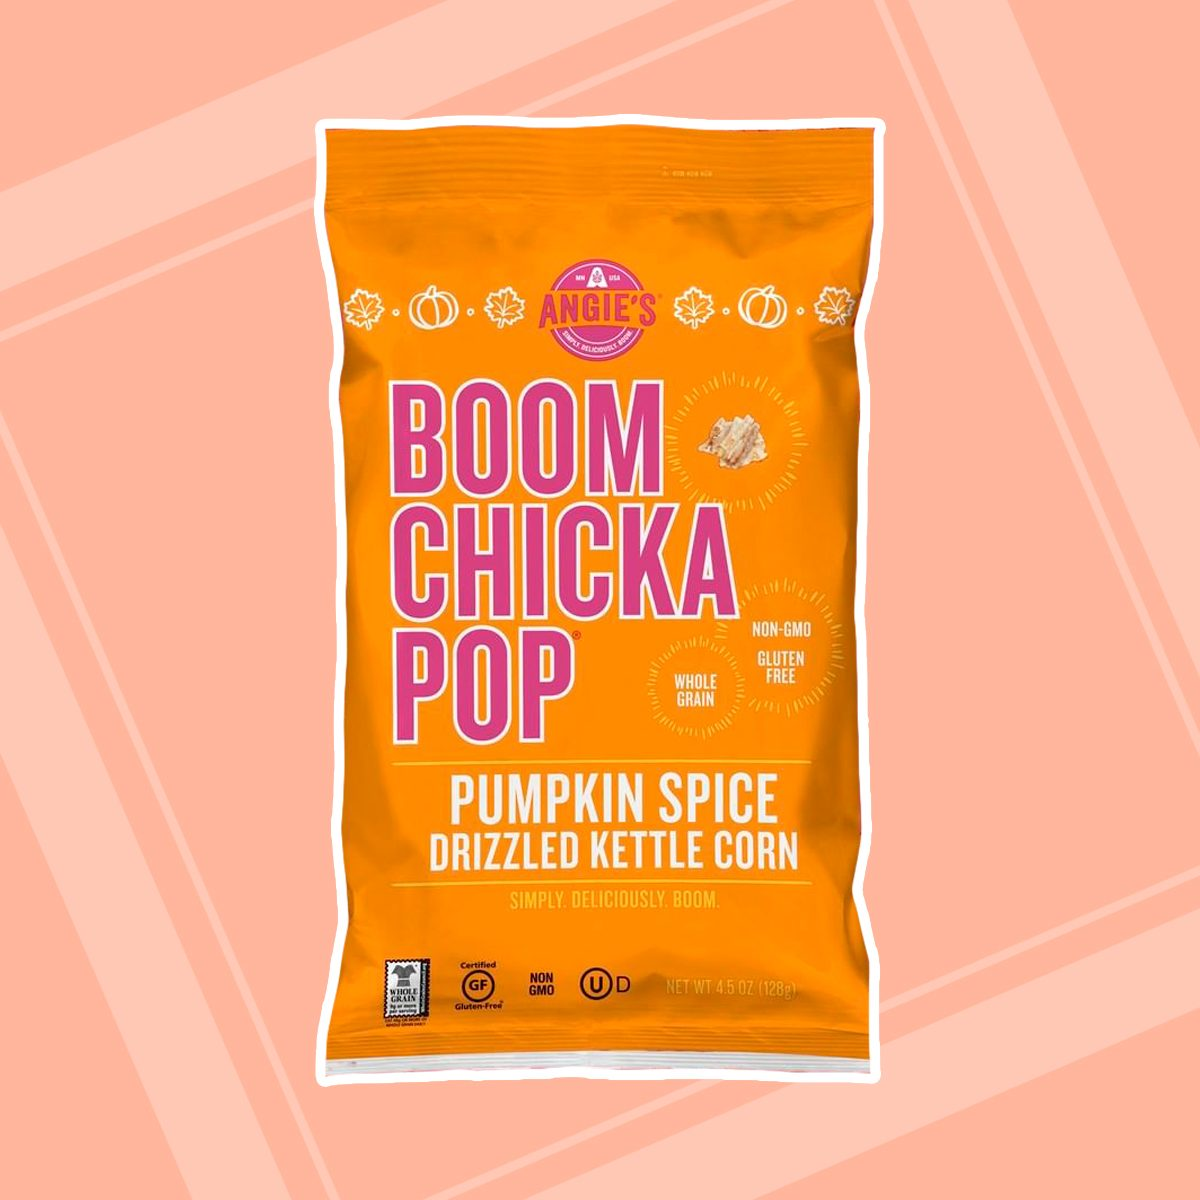 Boom Chicka Pop Pumpkin Spice Drizzled Kettle Corn